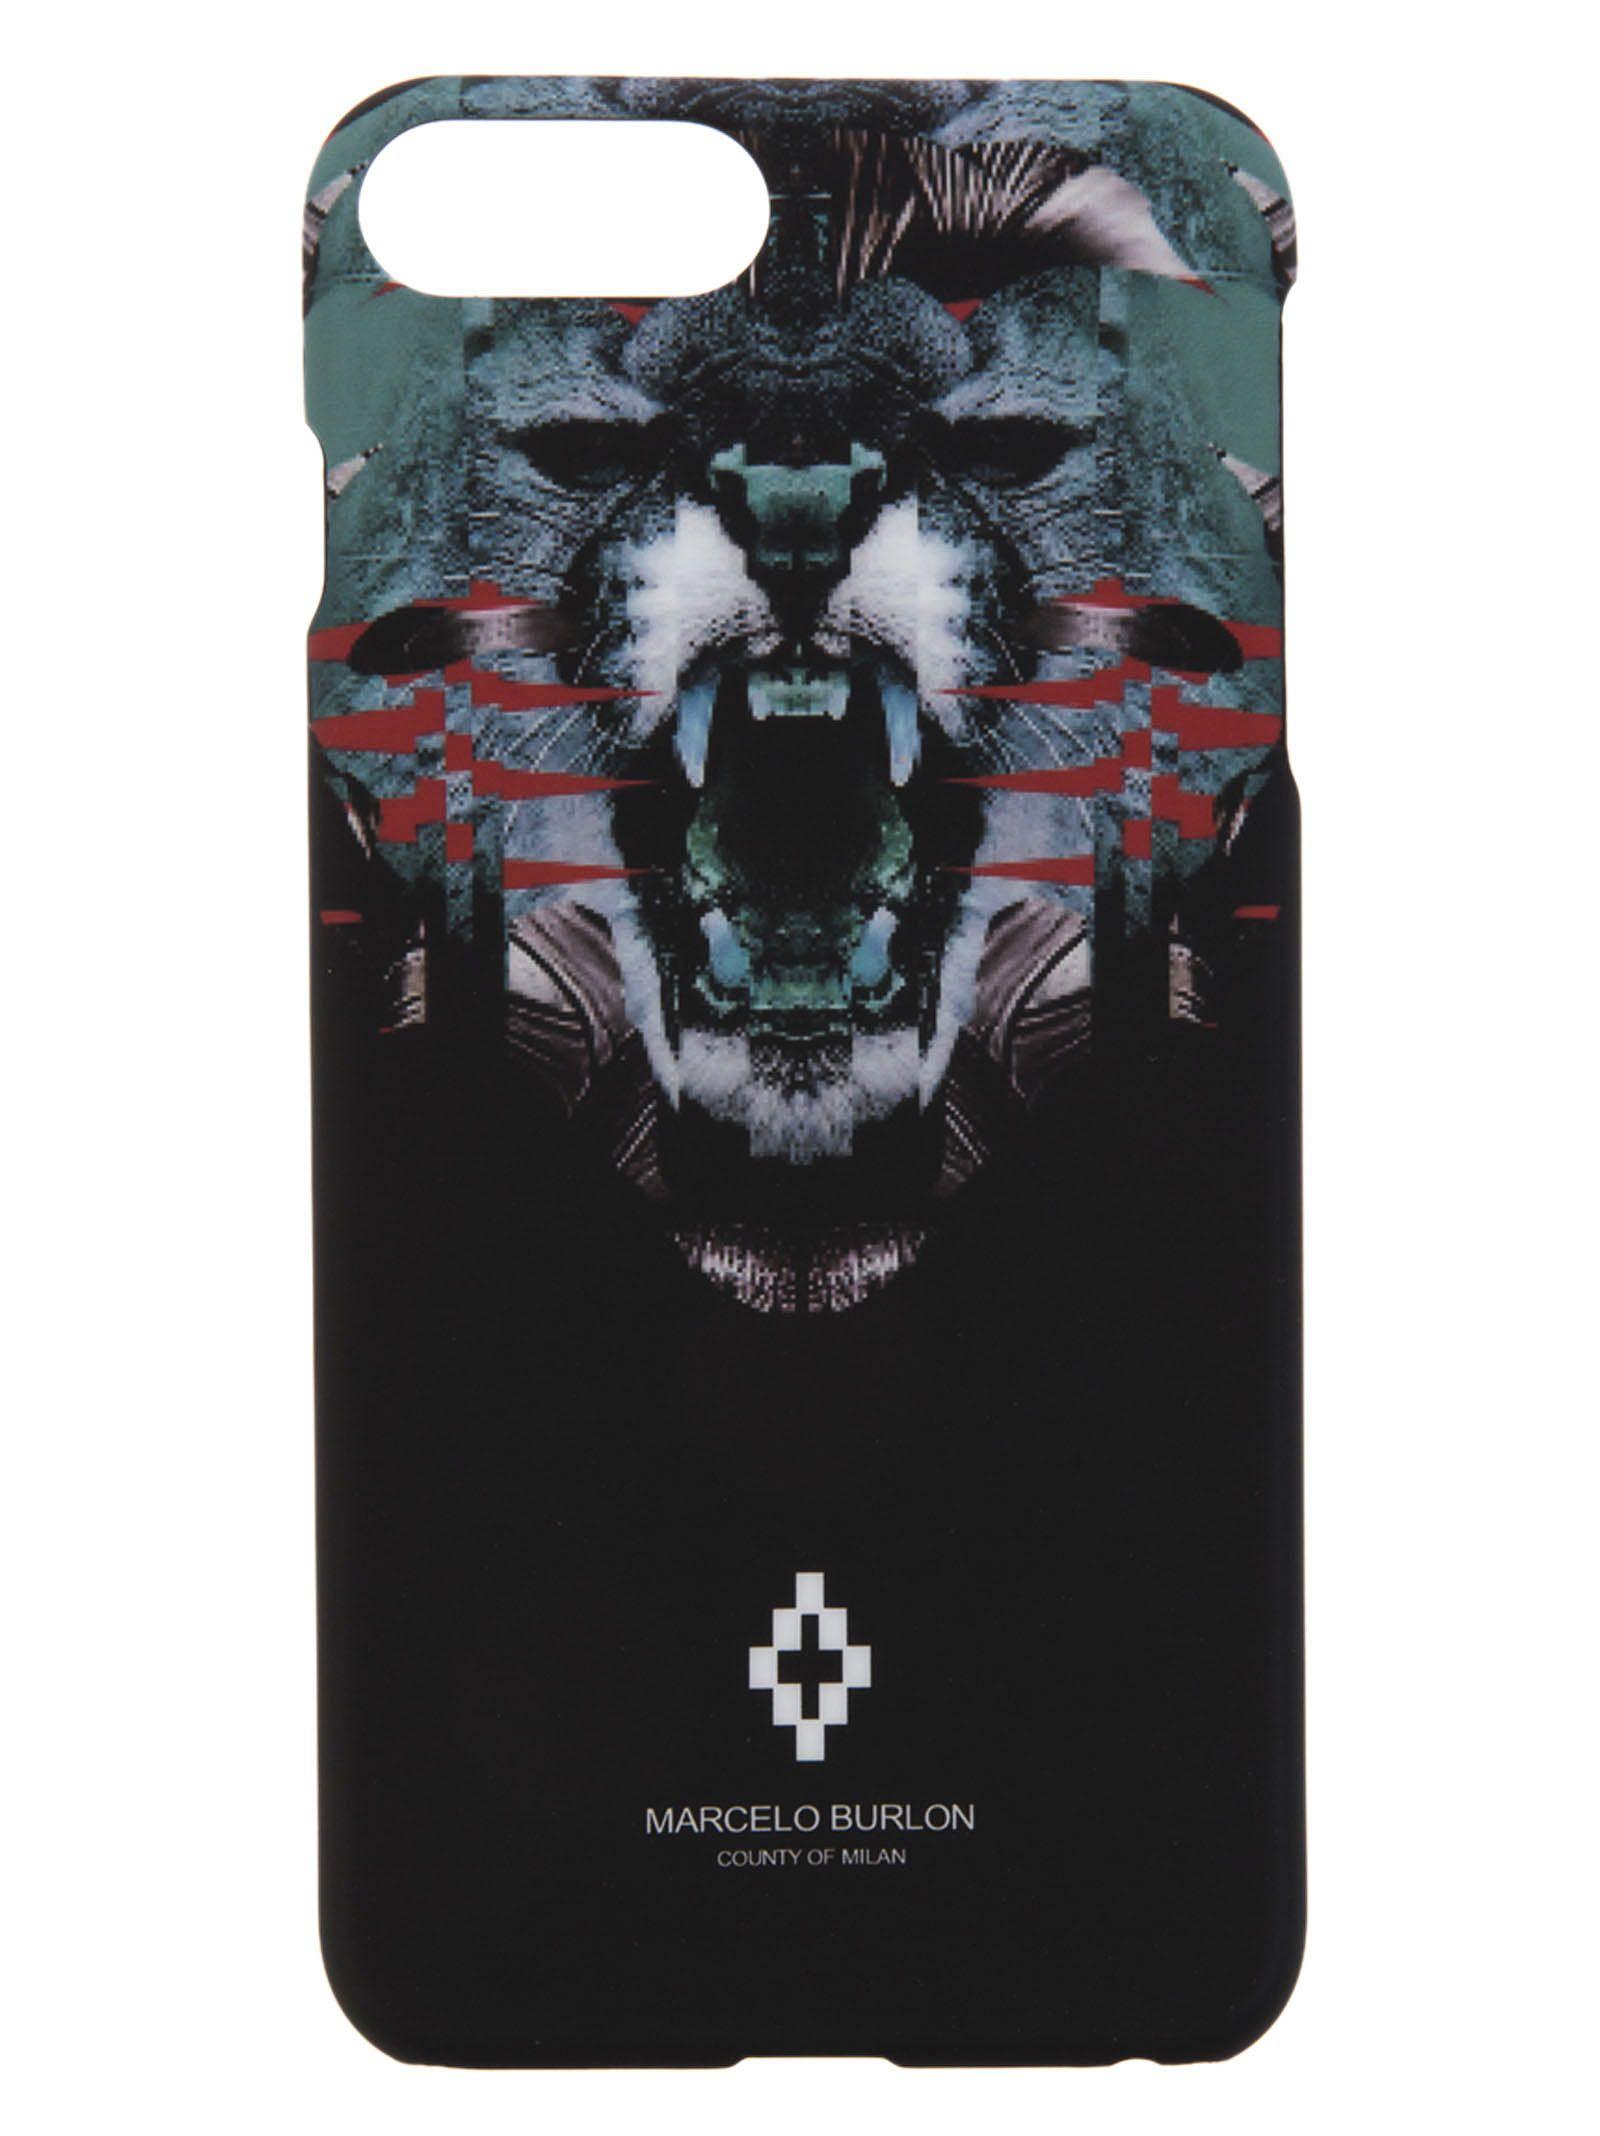 Marcelo Burlon Matawen Iphone 7 Plus Case 7859207